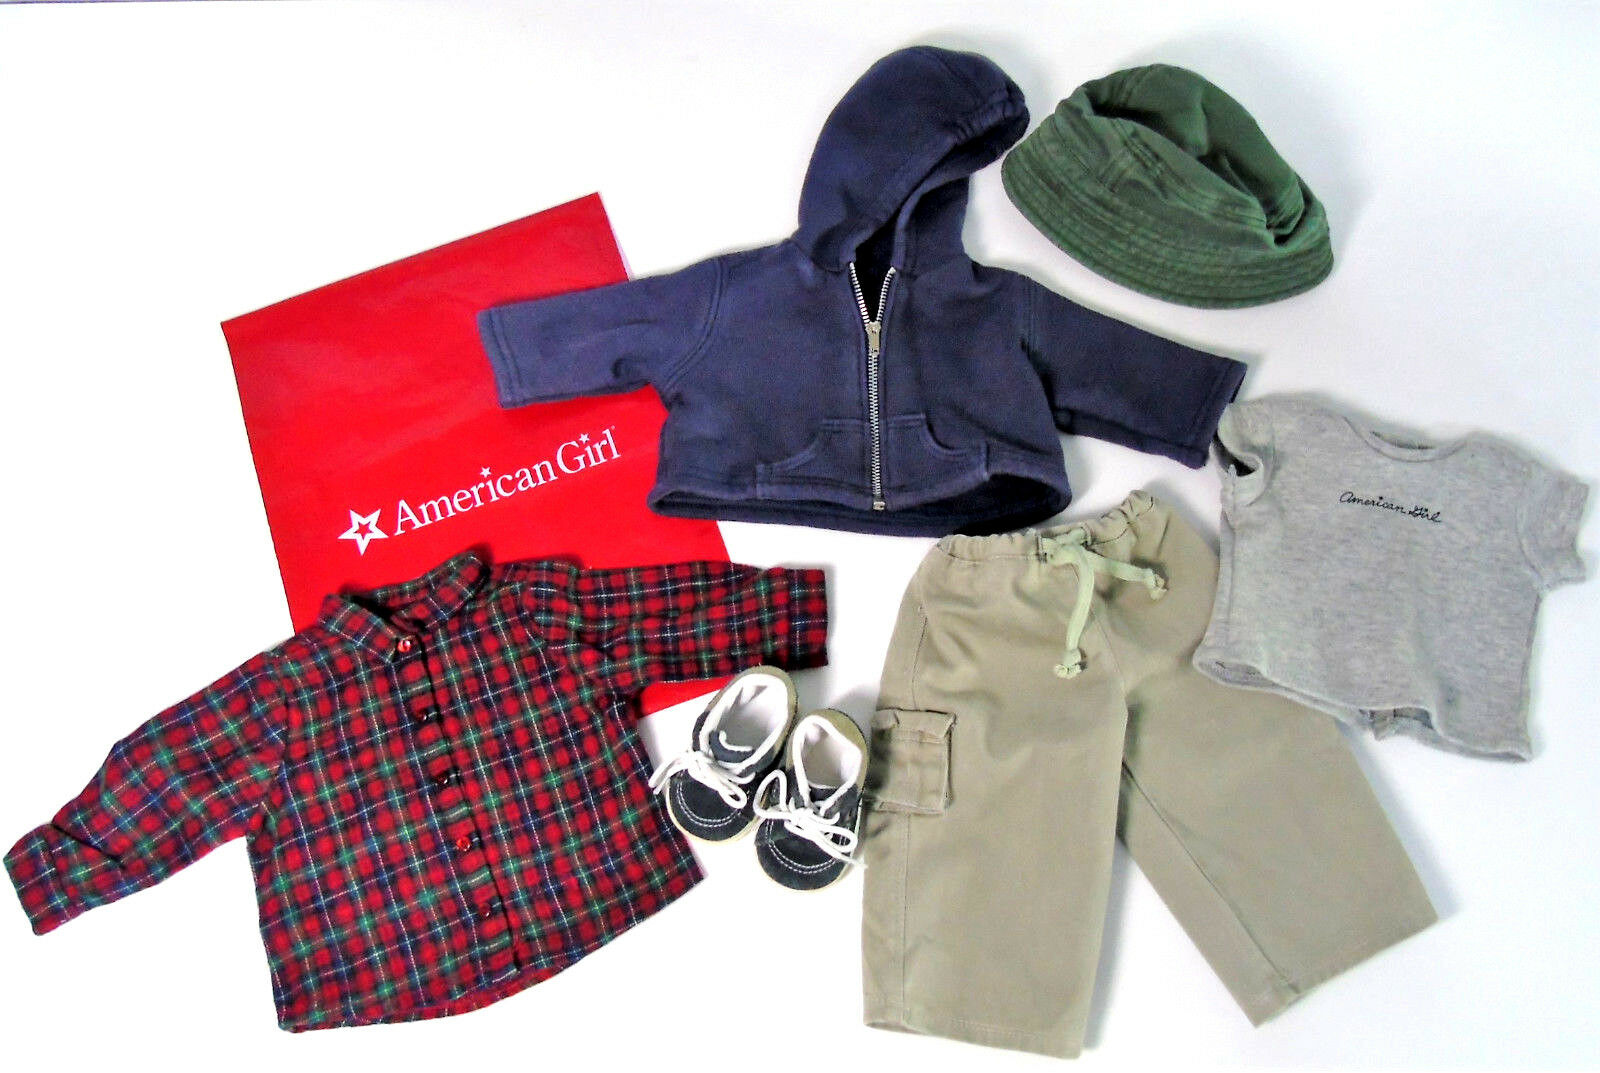 American Girl Puppe Kleidung Kordelzug Cargo Kariert Shirt Outfit Pleasant